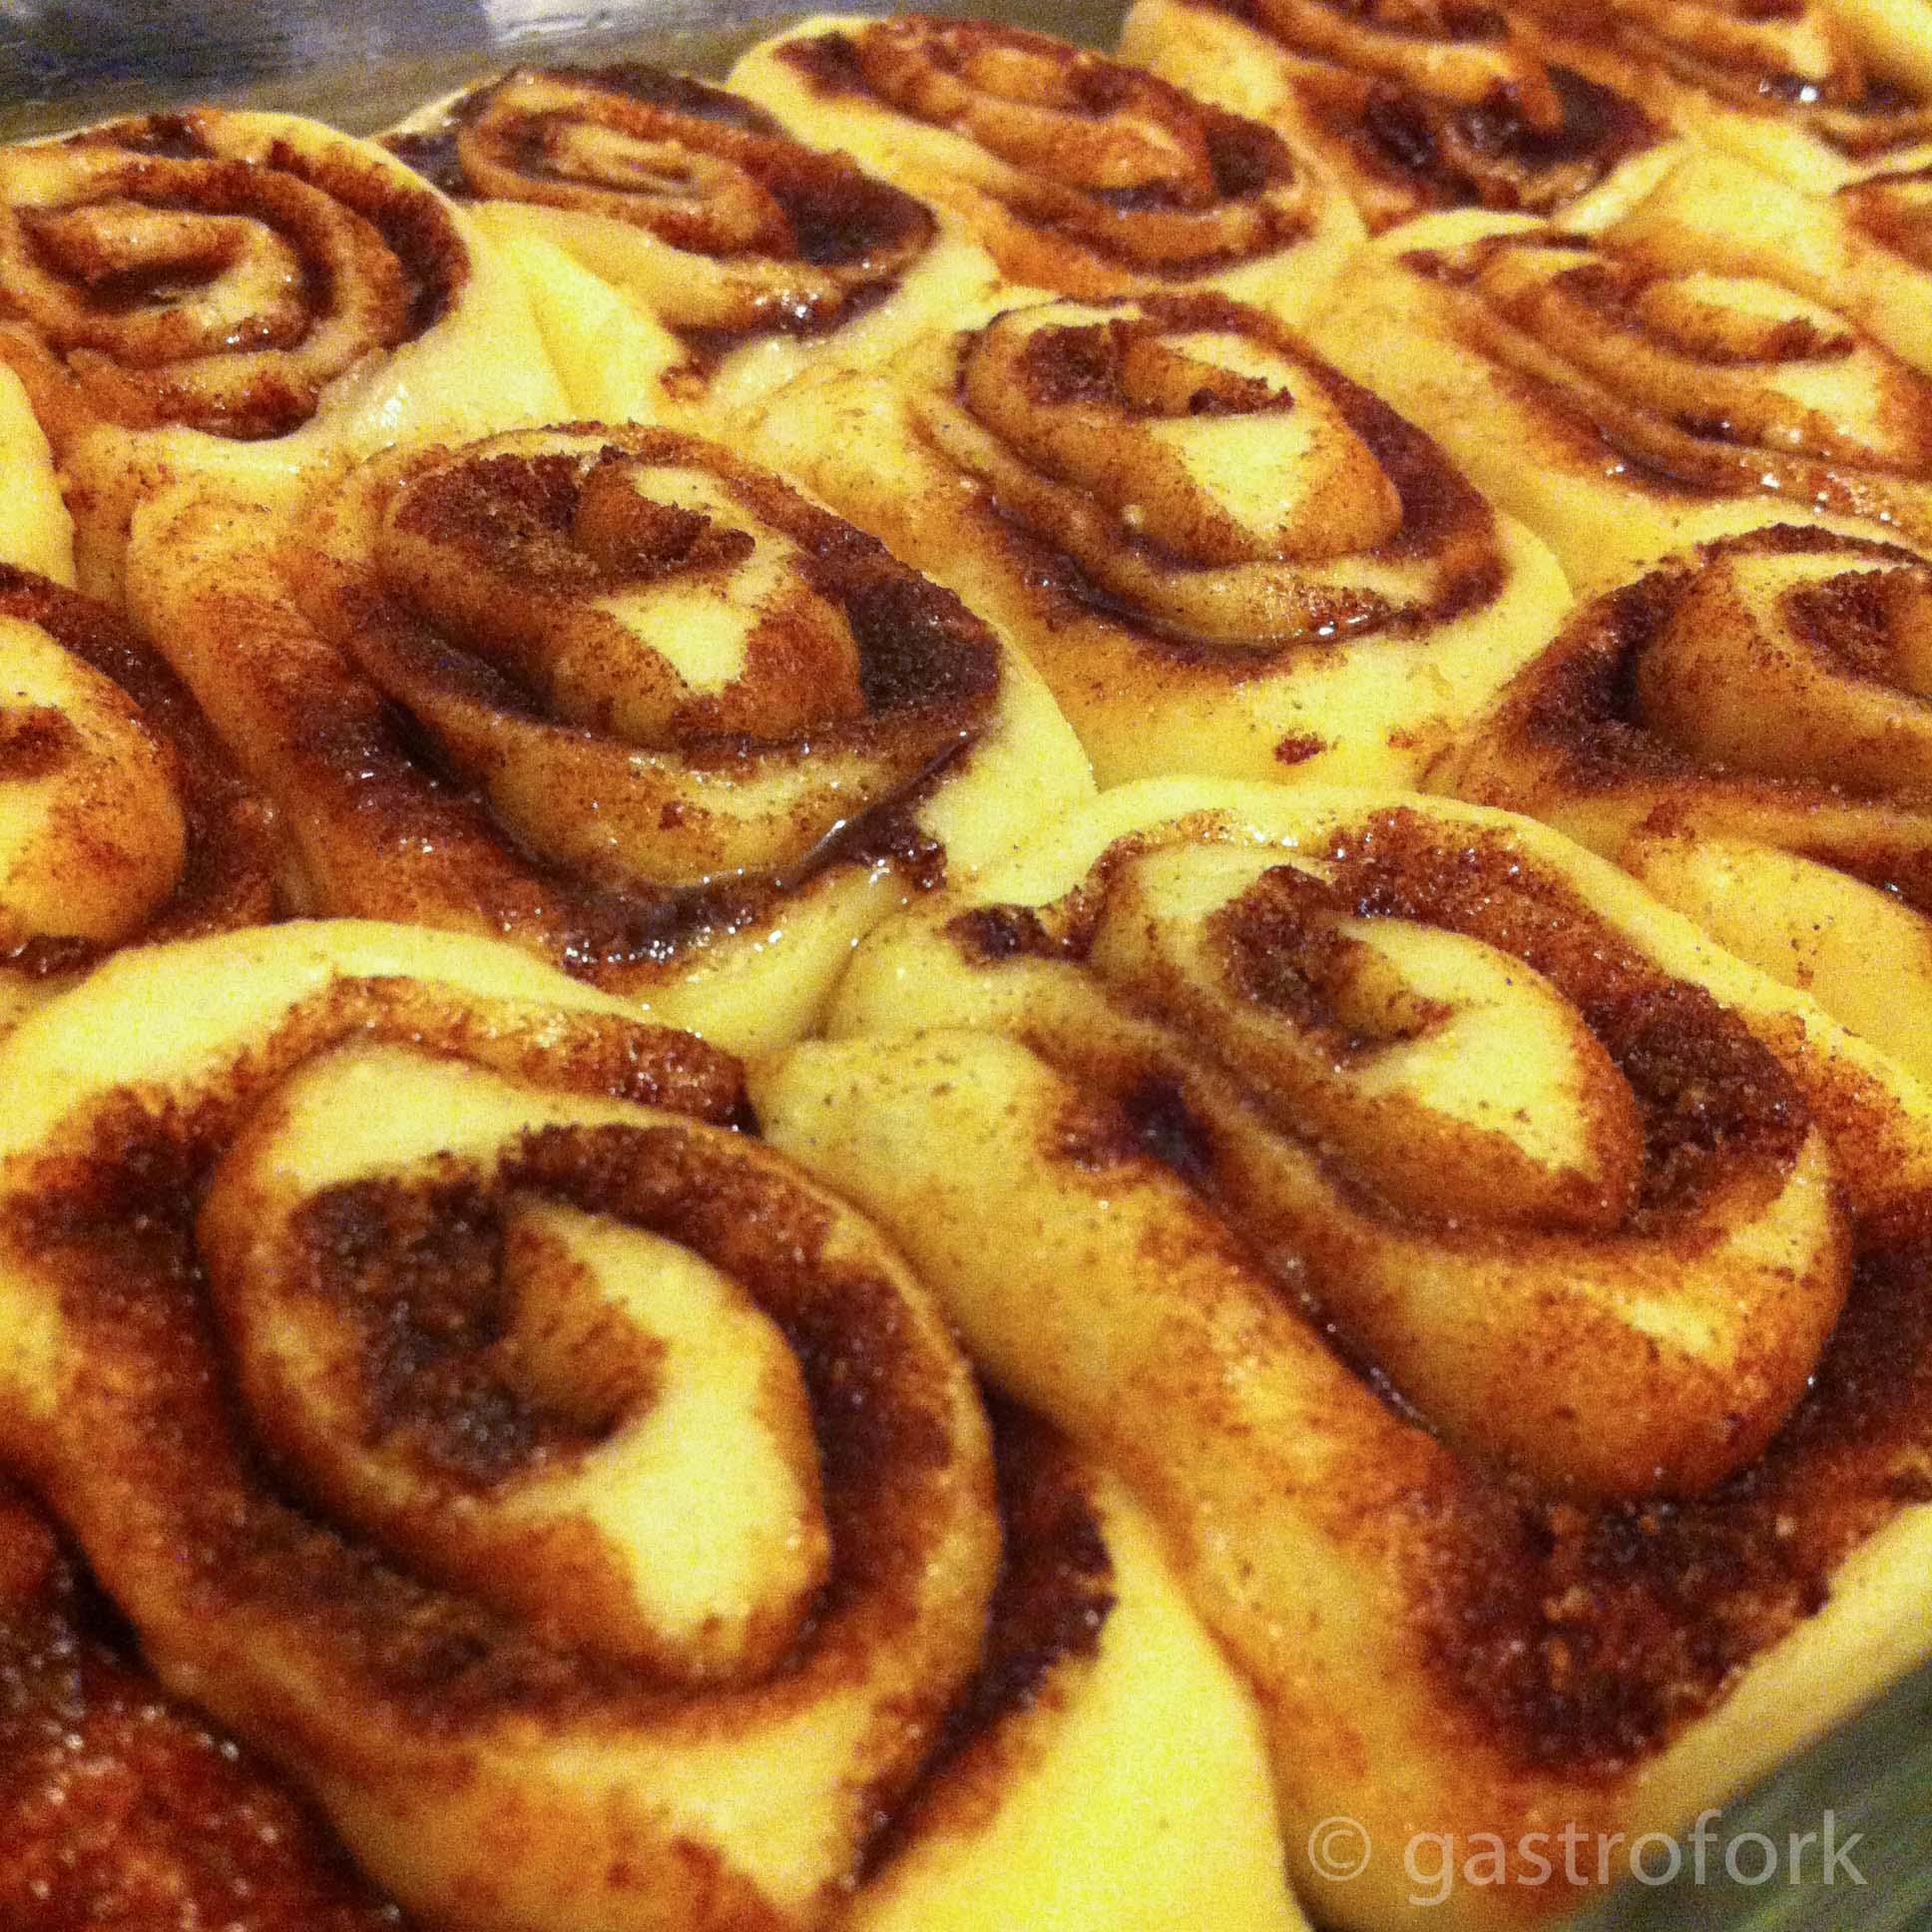 Easy, Soft Cinnamon Roll Recipe | gastrofork | Vancouver ...